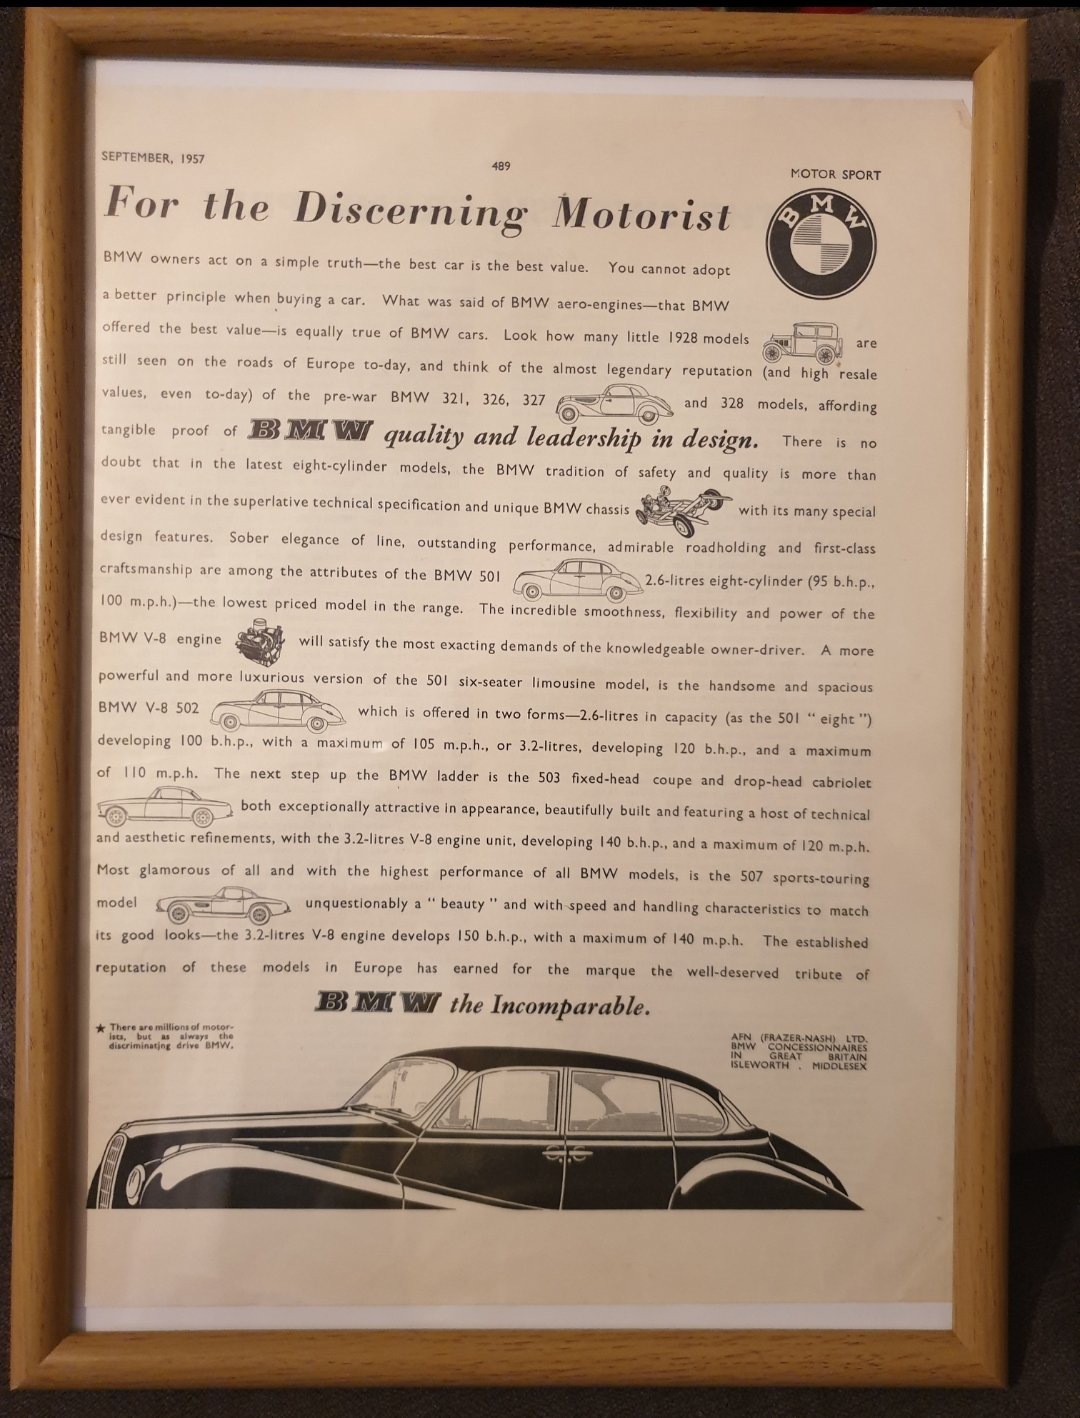 1957 BMW Framed Advert Original  For Sale (picture 1 of 2)